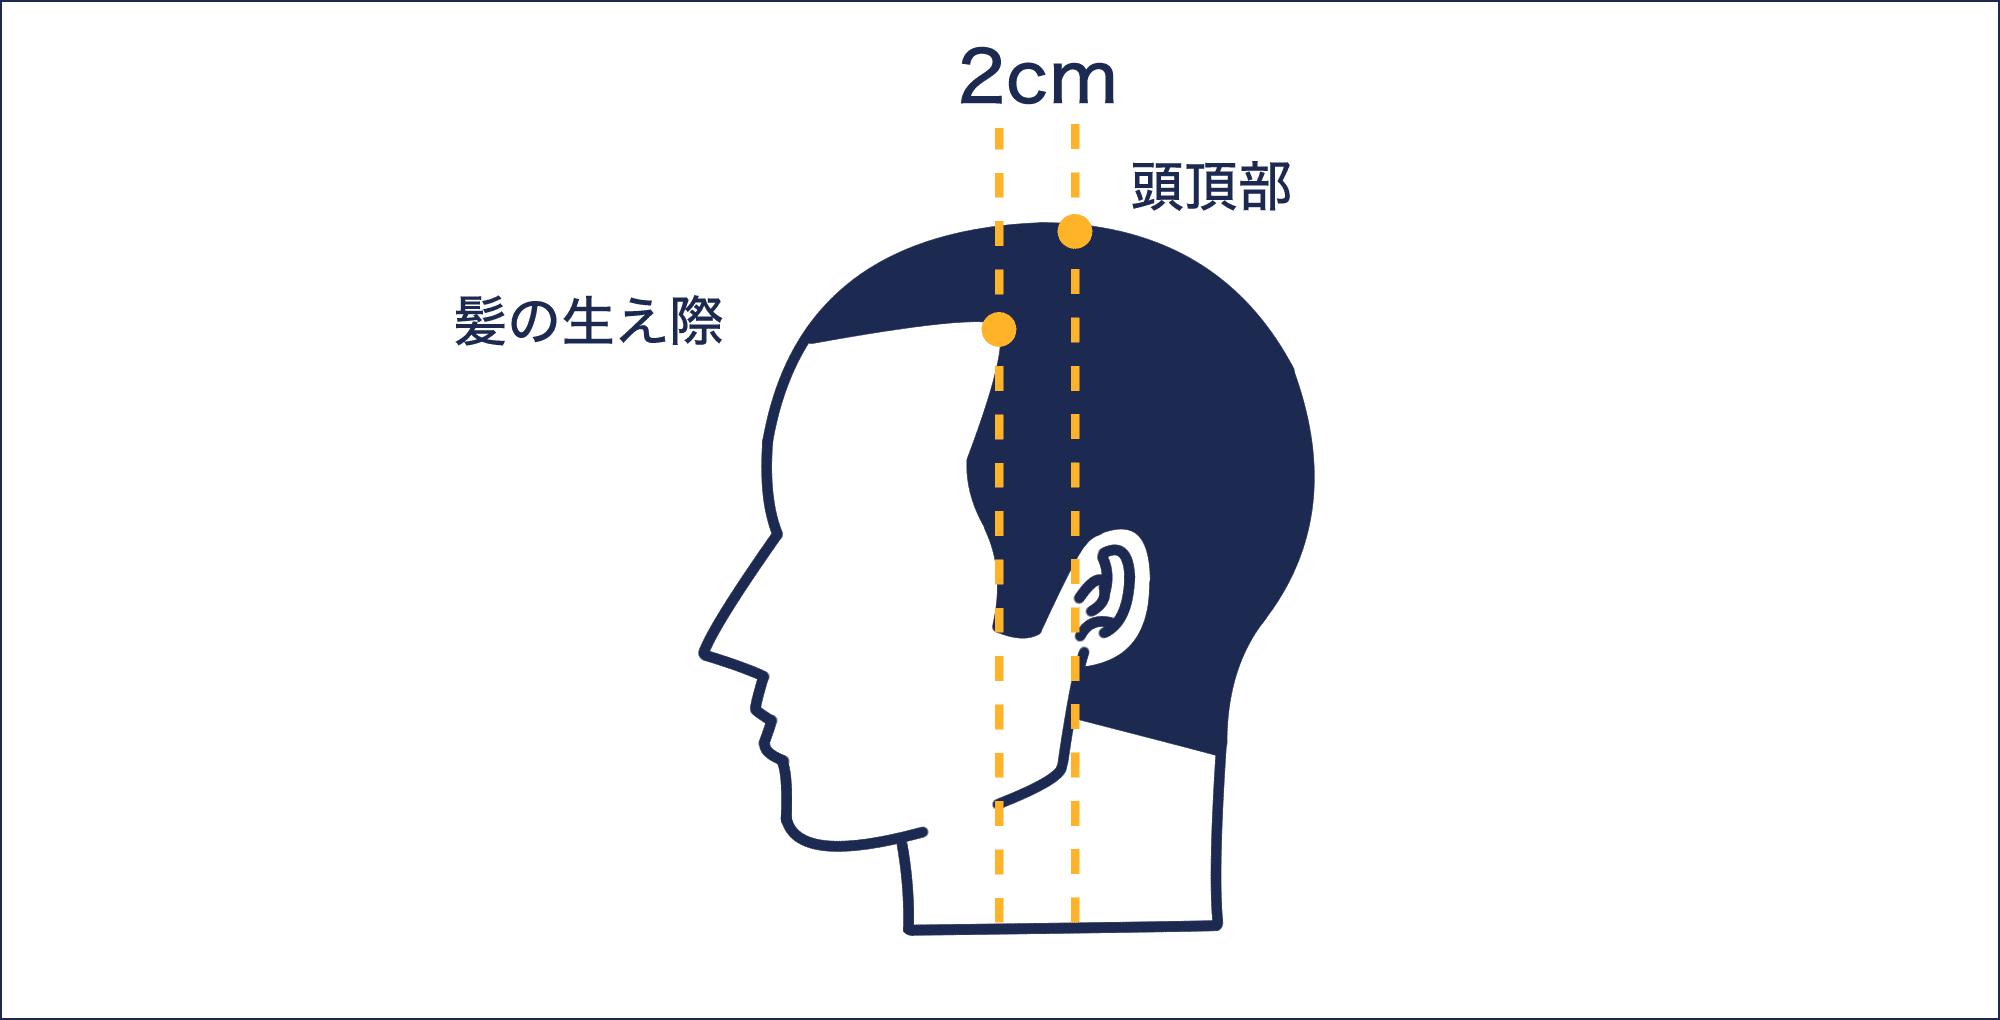 M字型に進行する脱毛症状の原因【症状から探す】